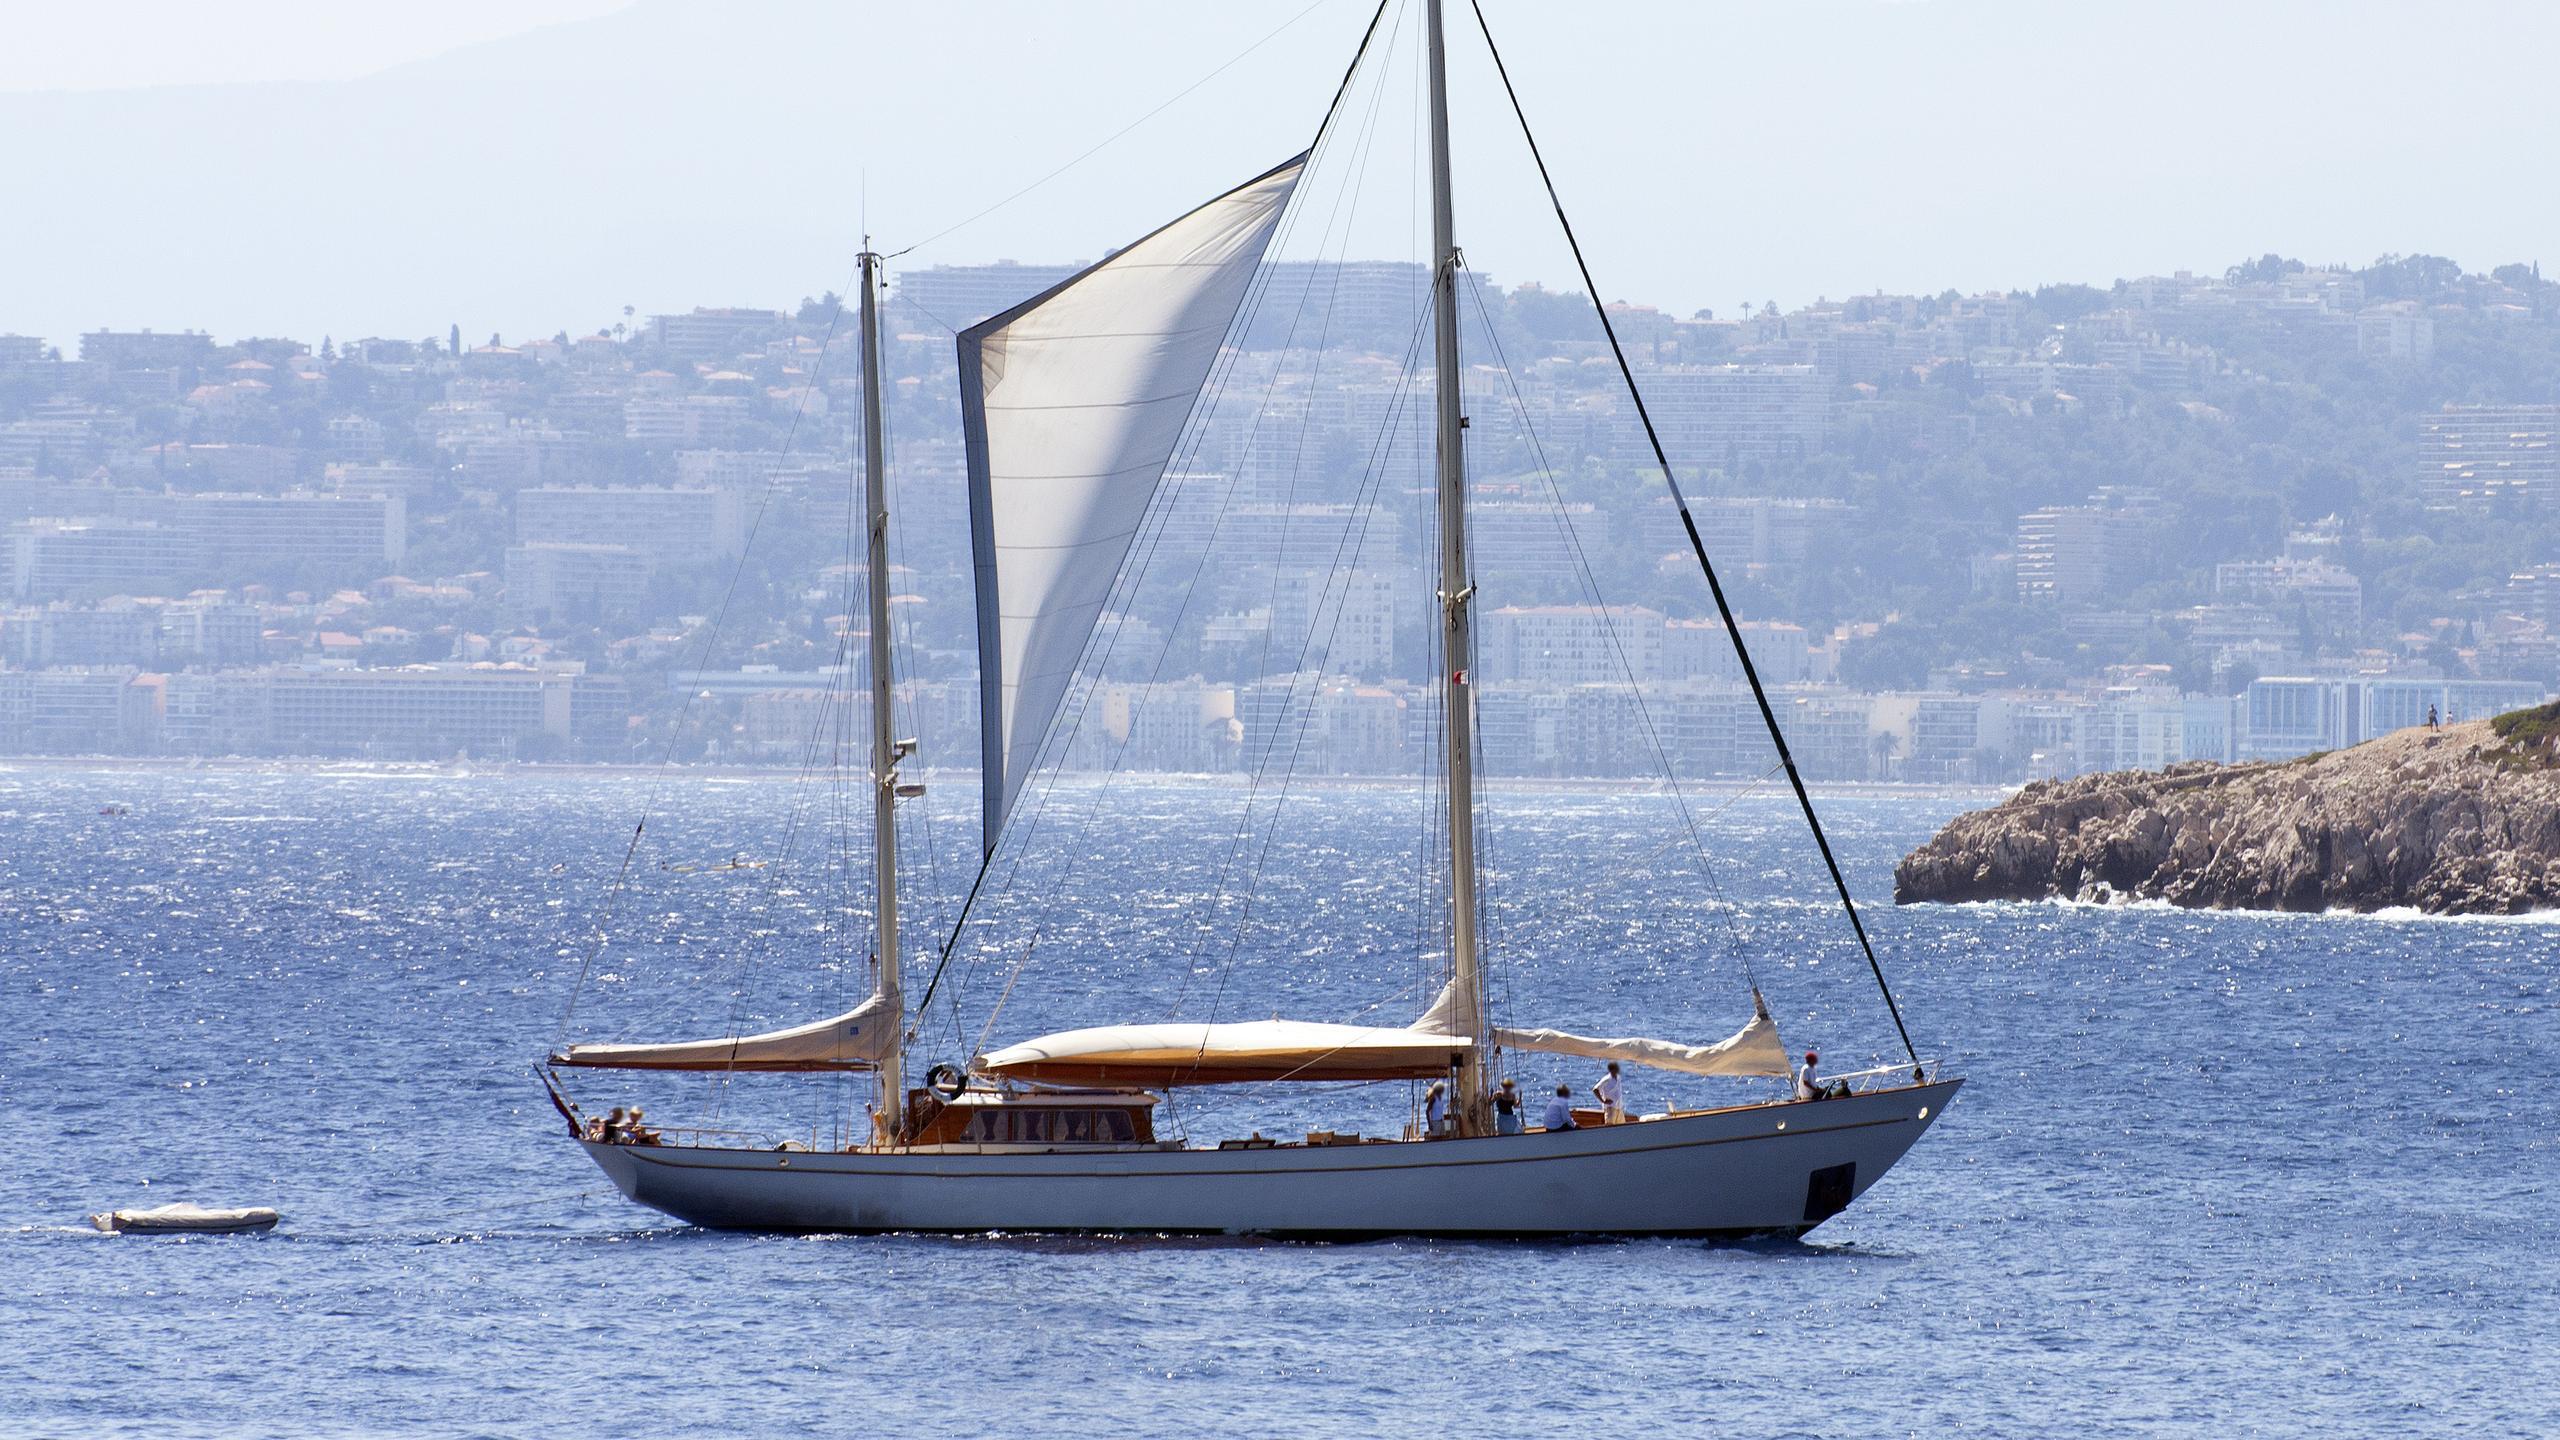 tamory-sailing-yacht-koser-meyer-1952-26m-profile